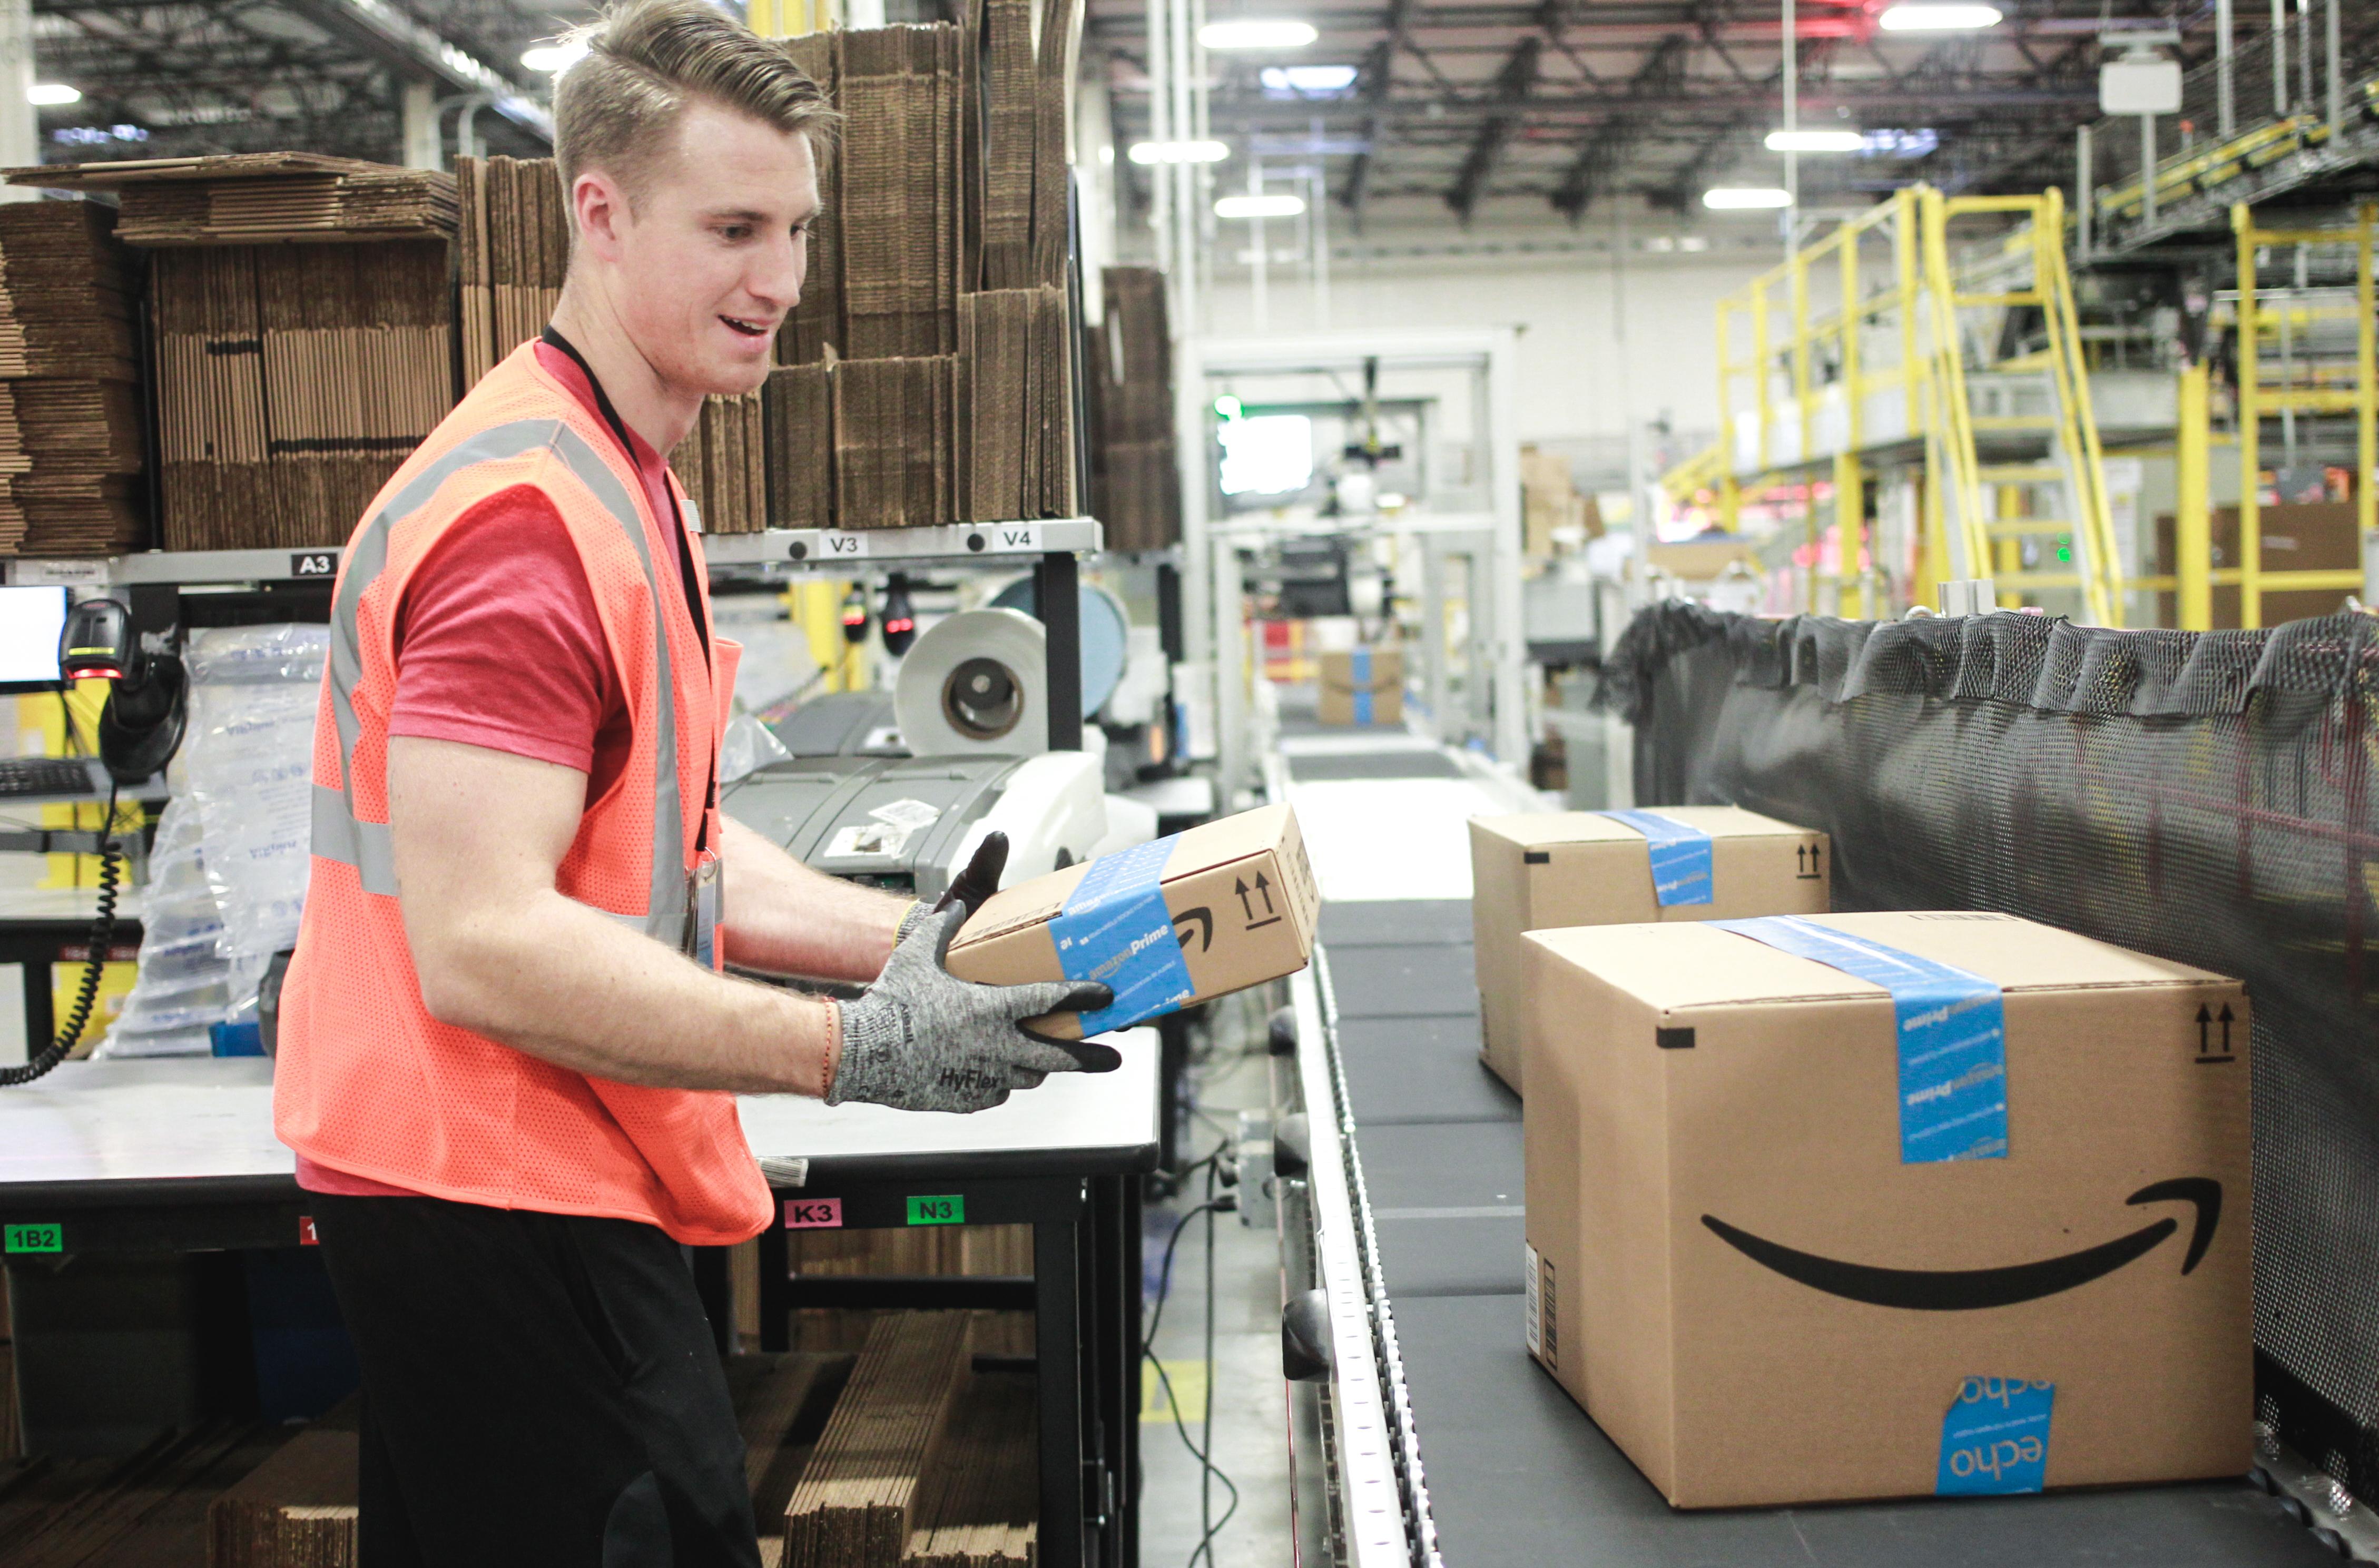 Man placing Amazon box on a conveyor belt.